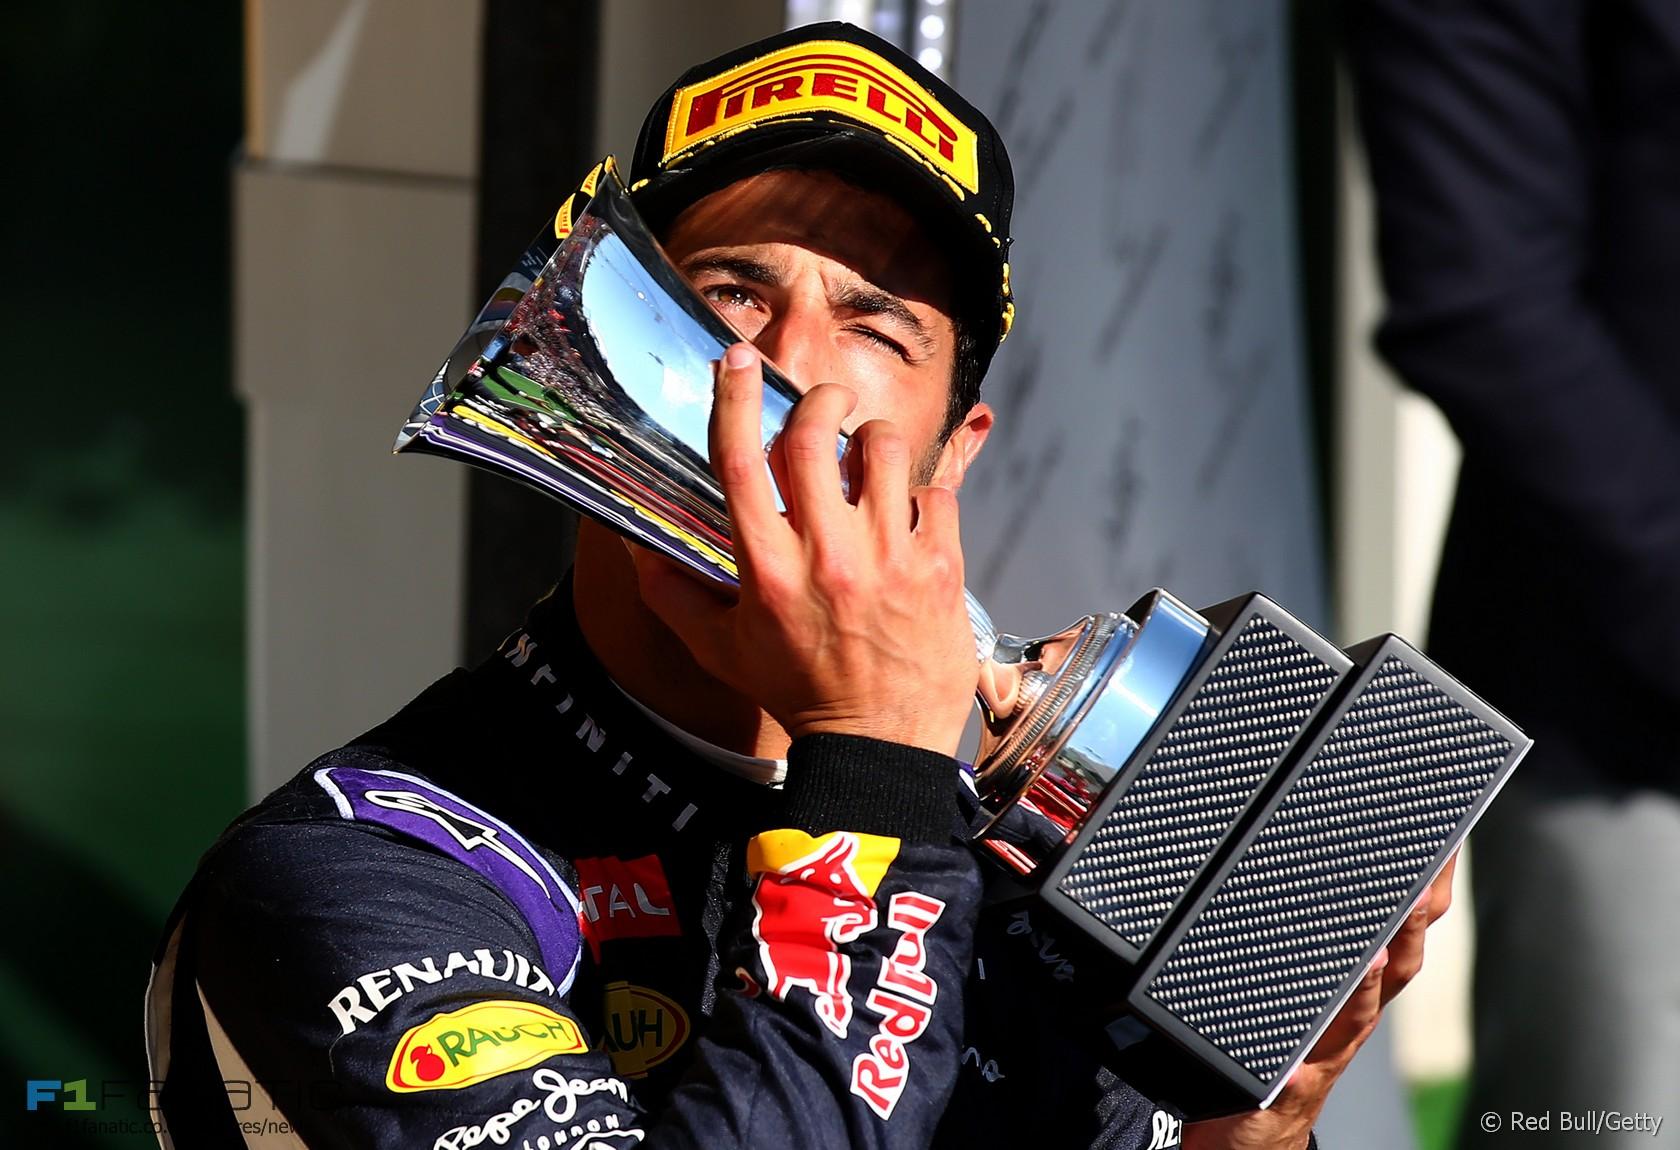 Daniel Ricciardo, Red Bull, Hungaroring, 2015